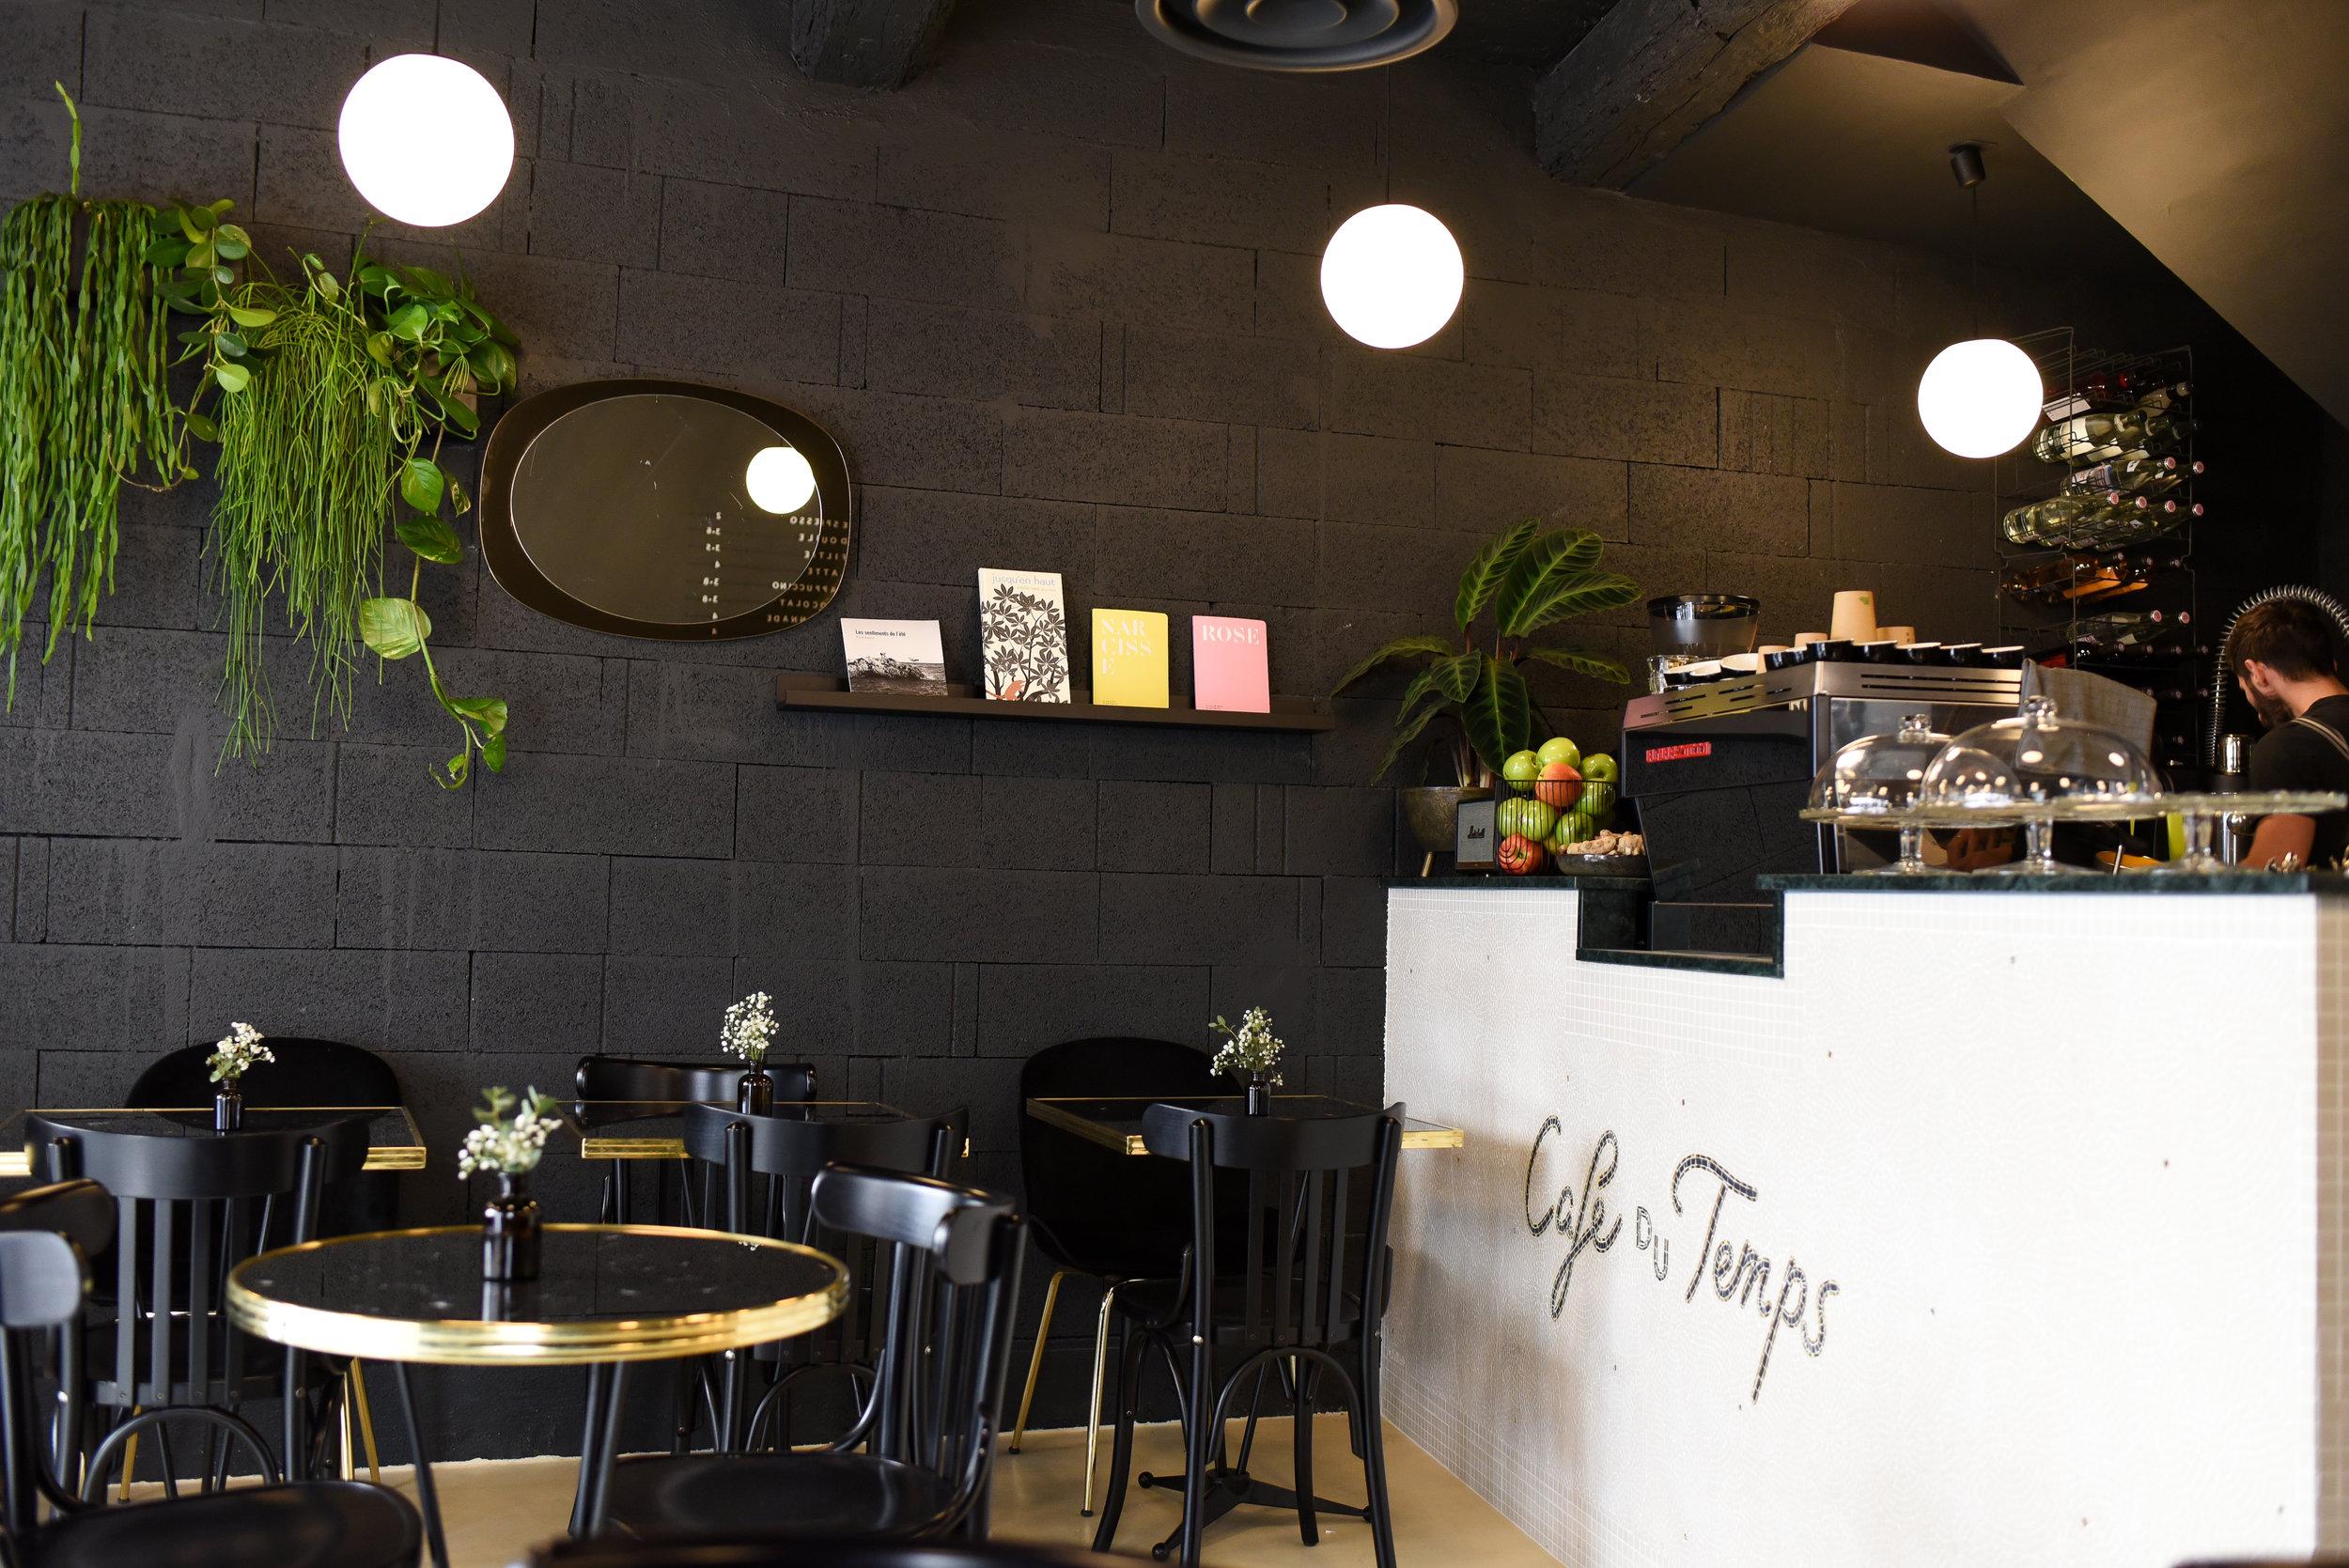 twinky-lizzy-blog-aix-en-provence-cafe-du-temps-restaurant-vegan-9.jpg